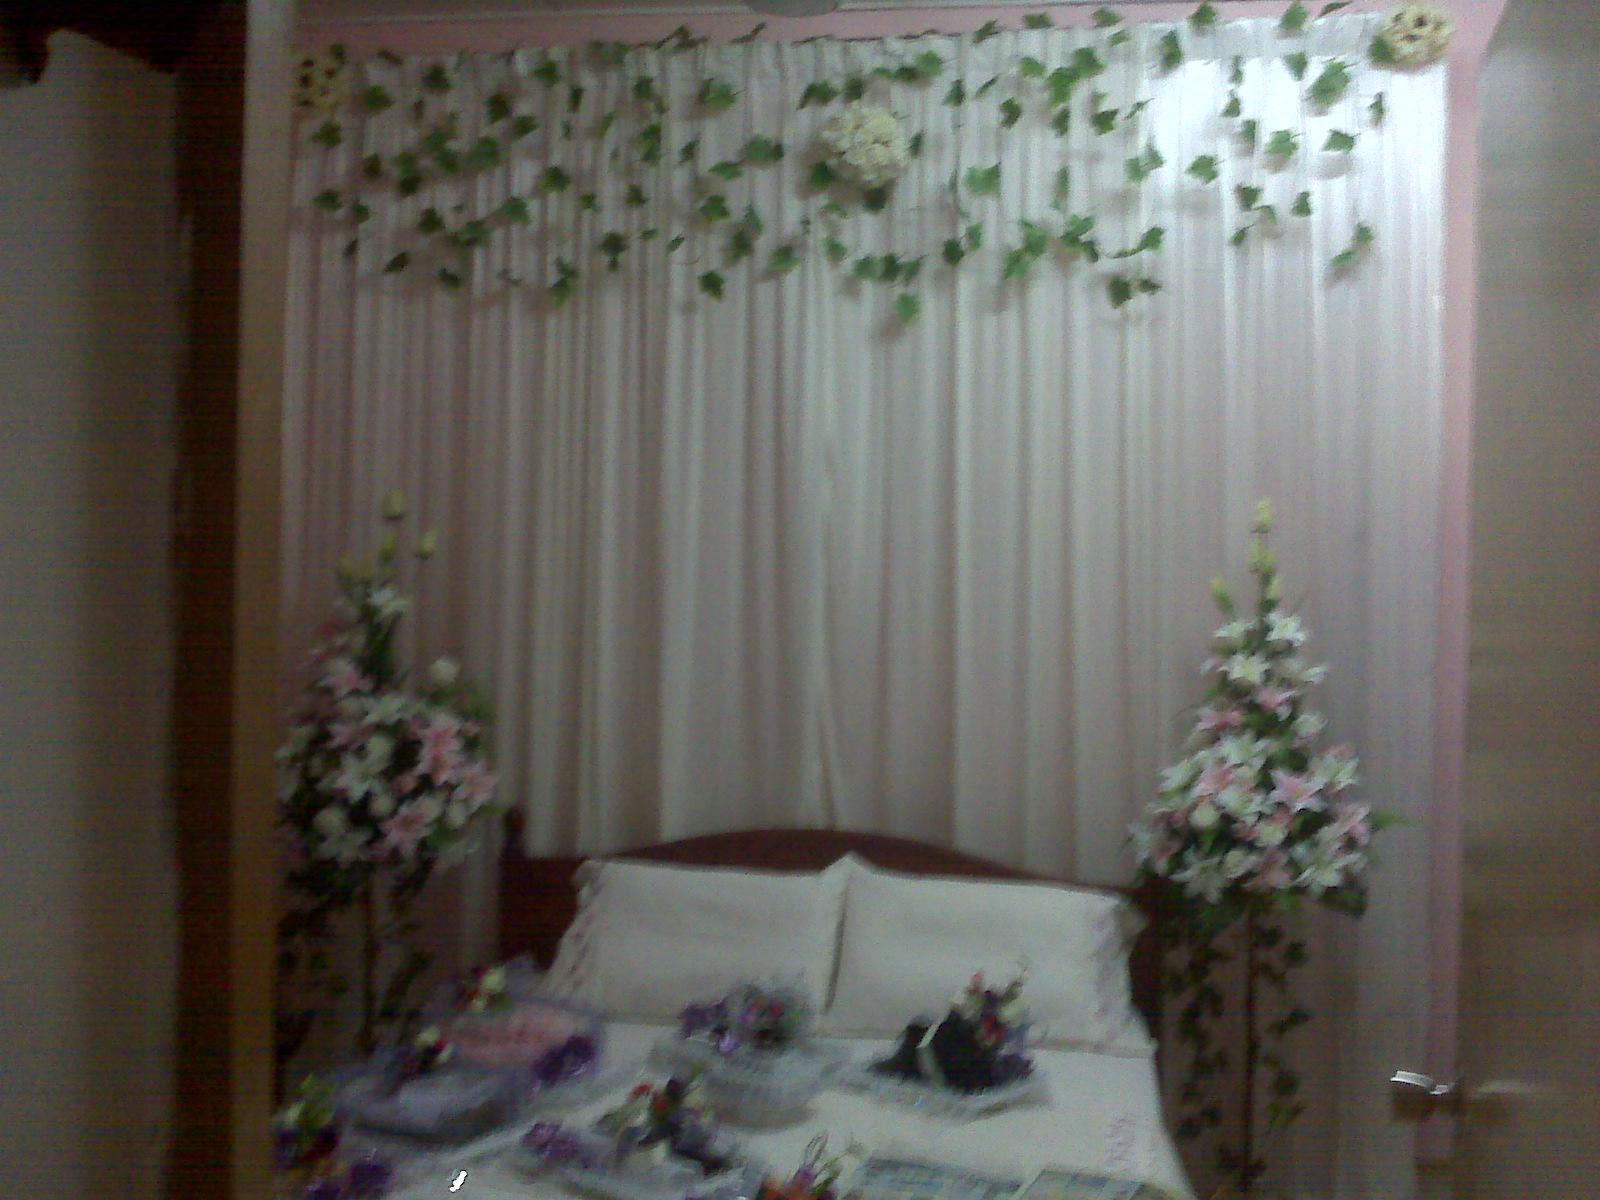 Simple Rite Bilik Tidur Pengantin Pinterest Bedrooms And Room Butik Ar Ra 03 01 2017 04